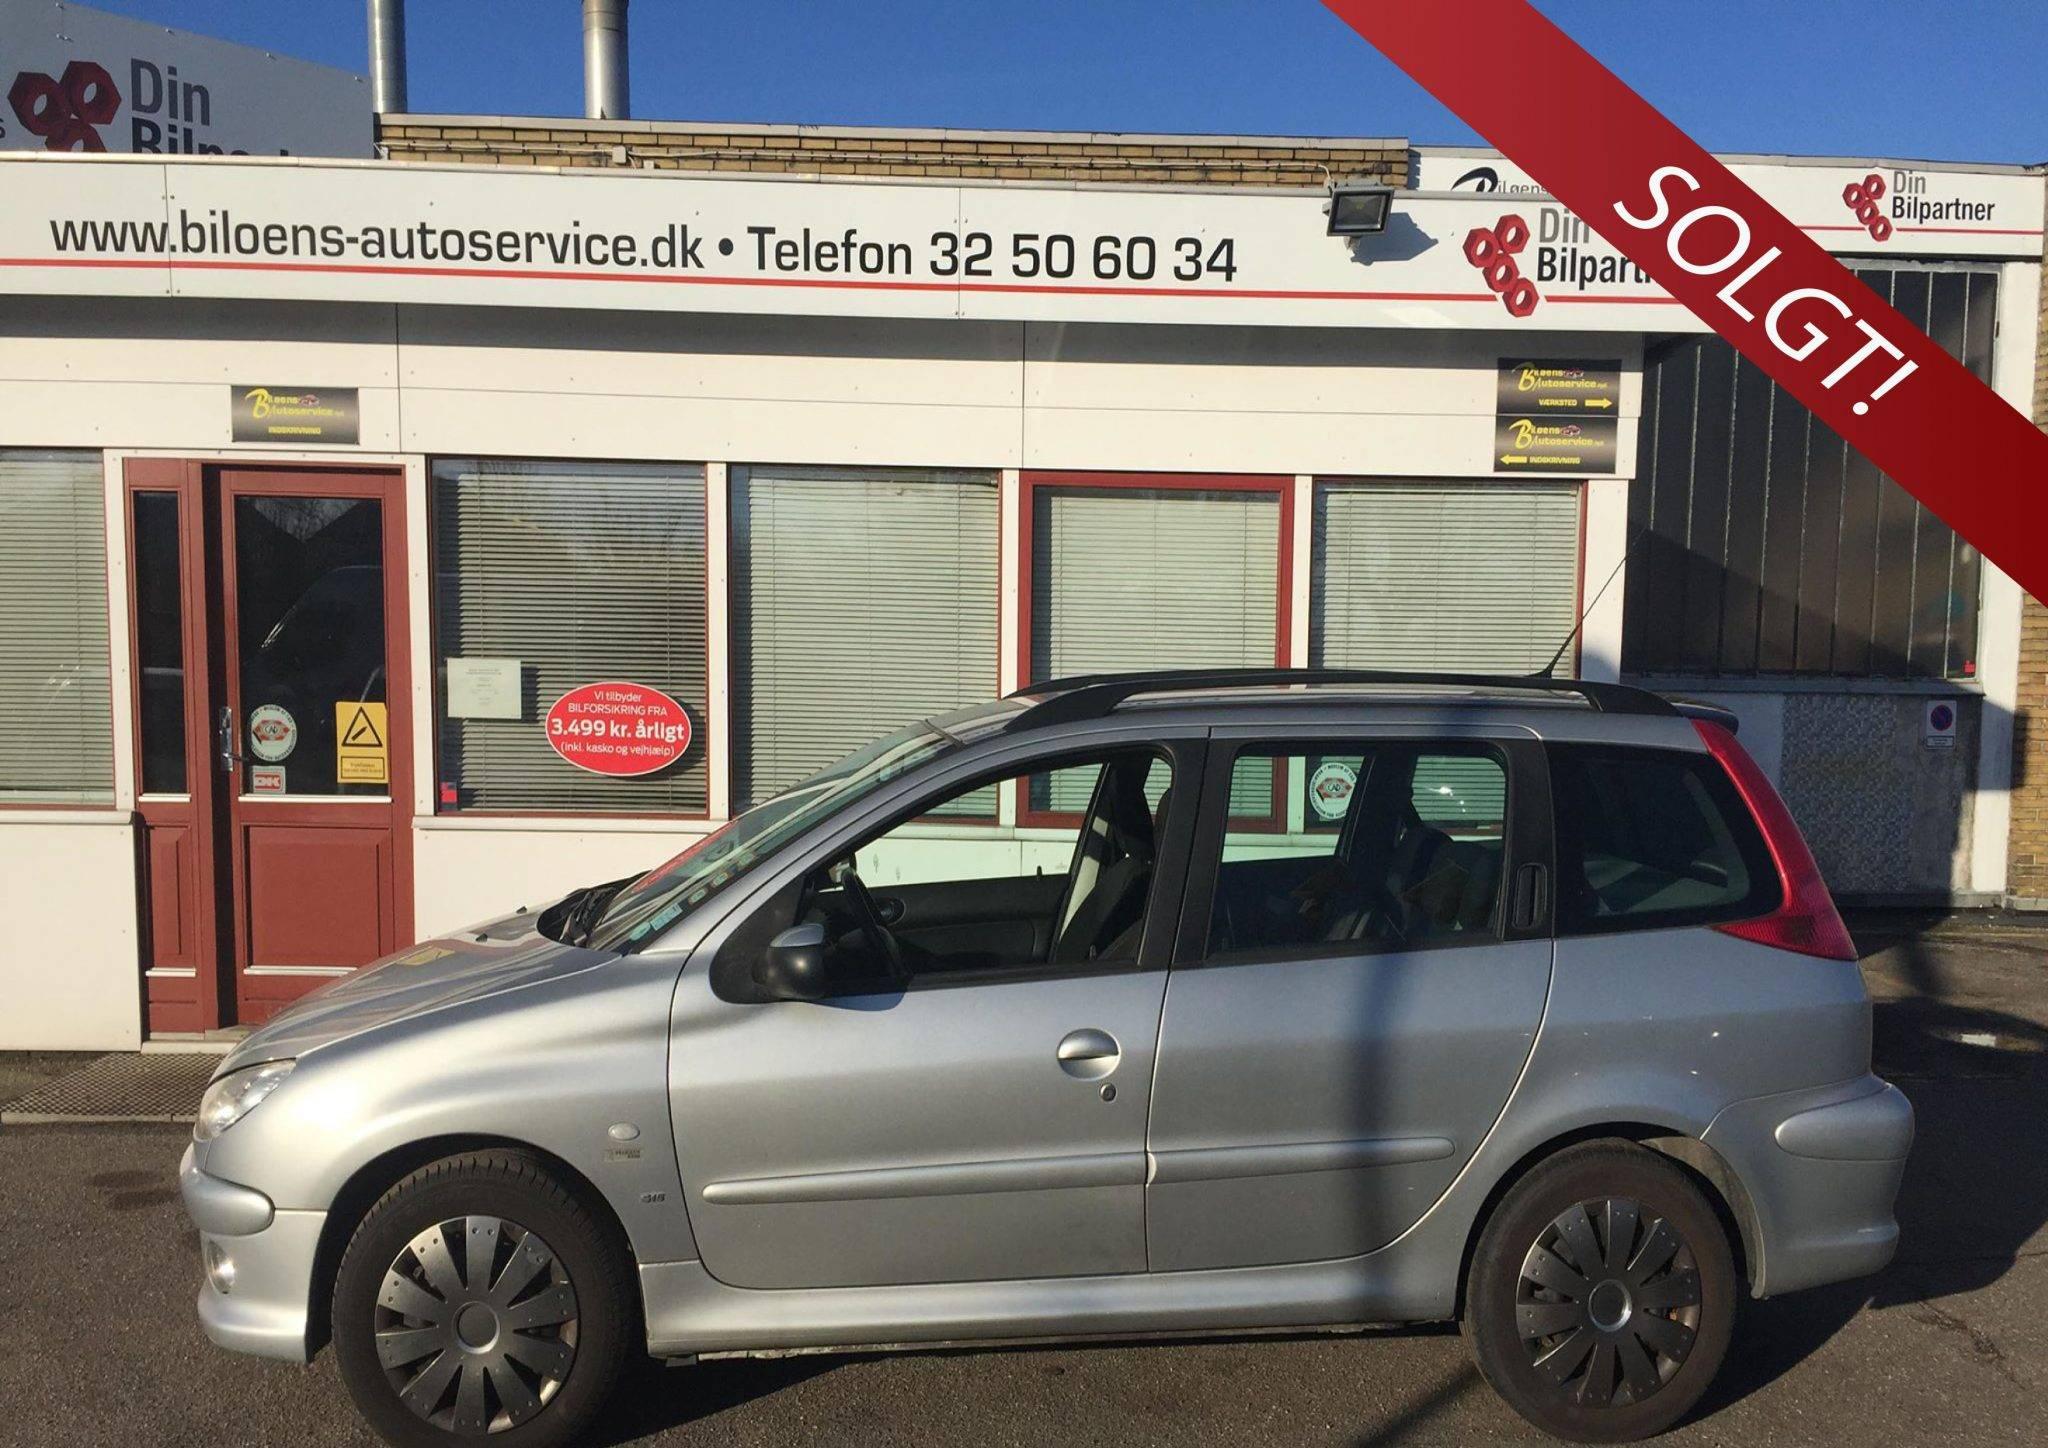 p1 solgt - Bilsalg